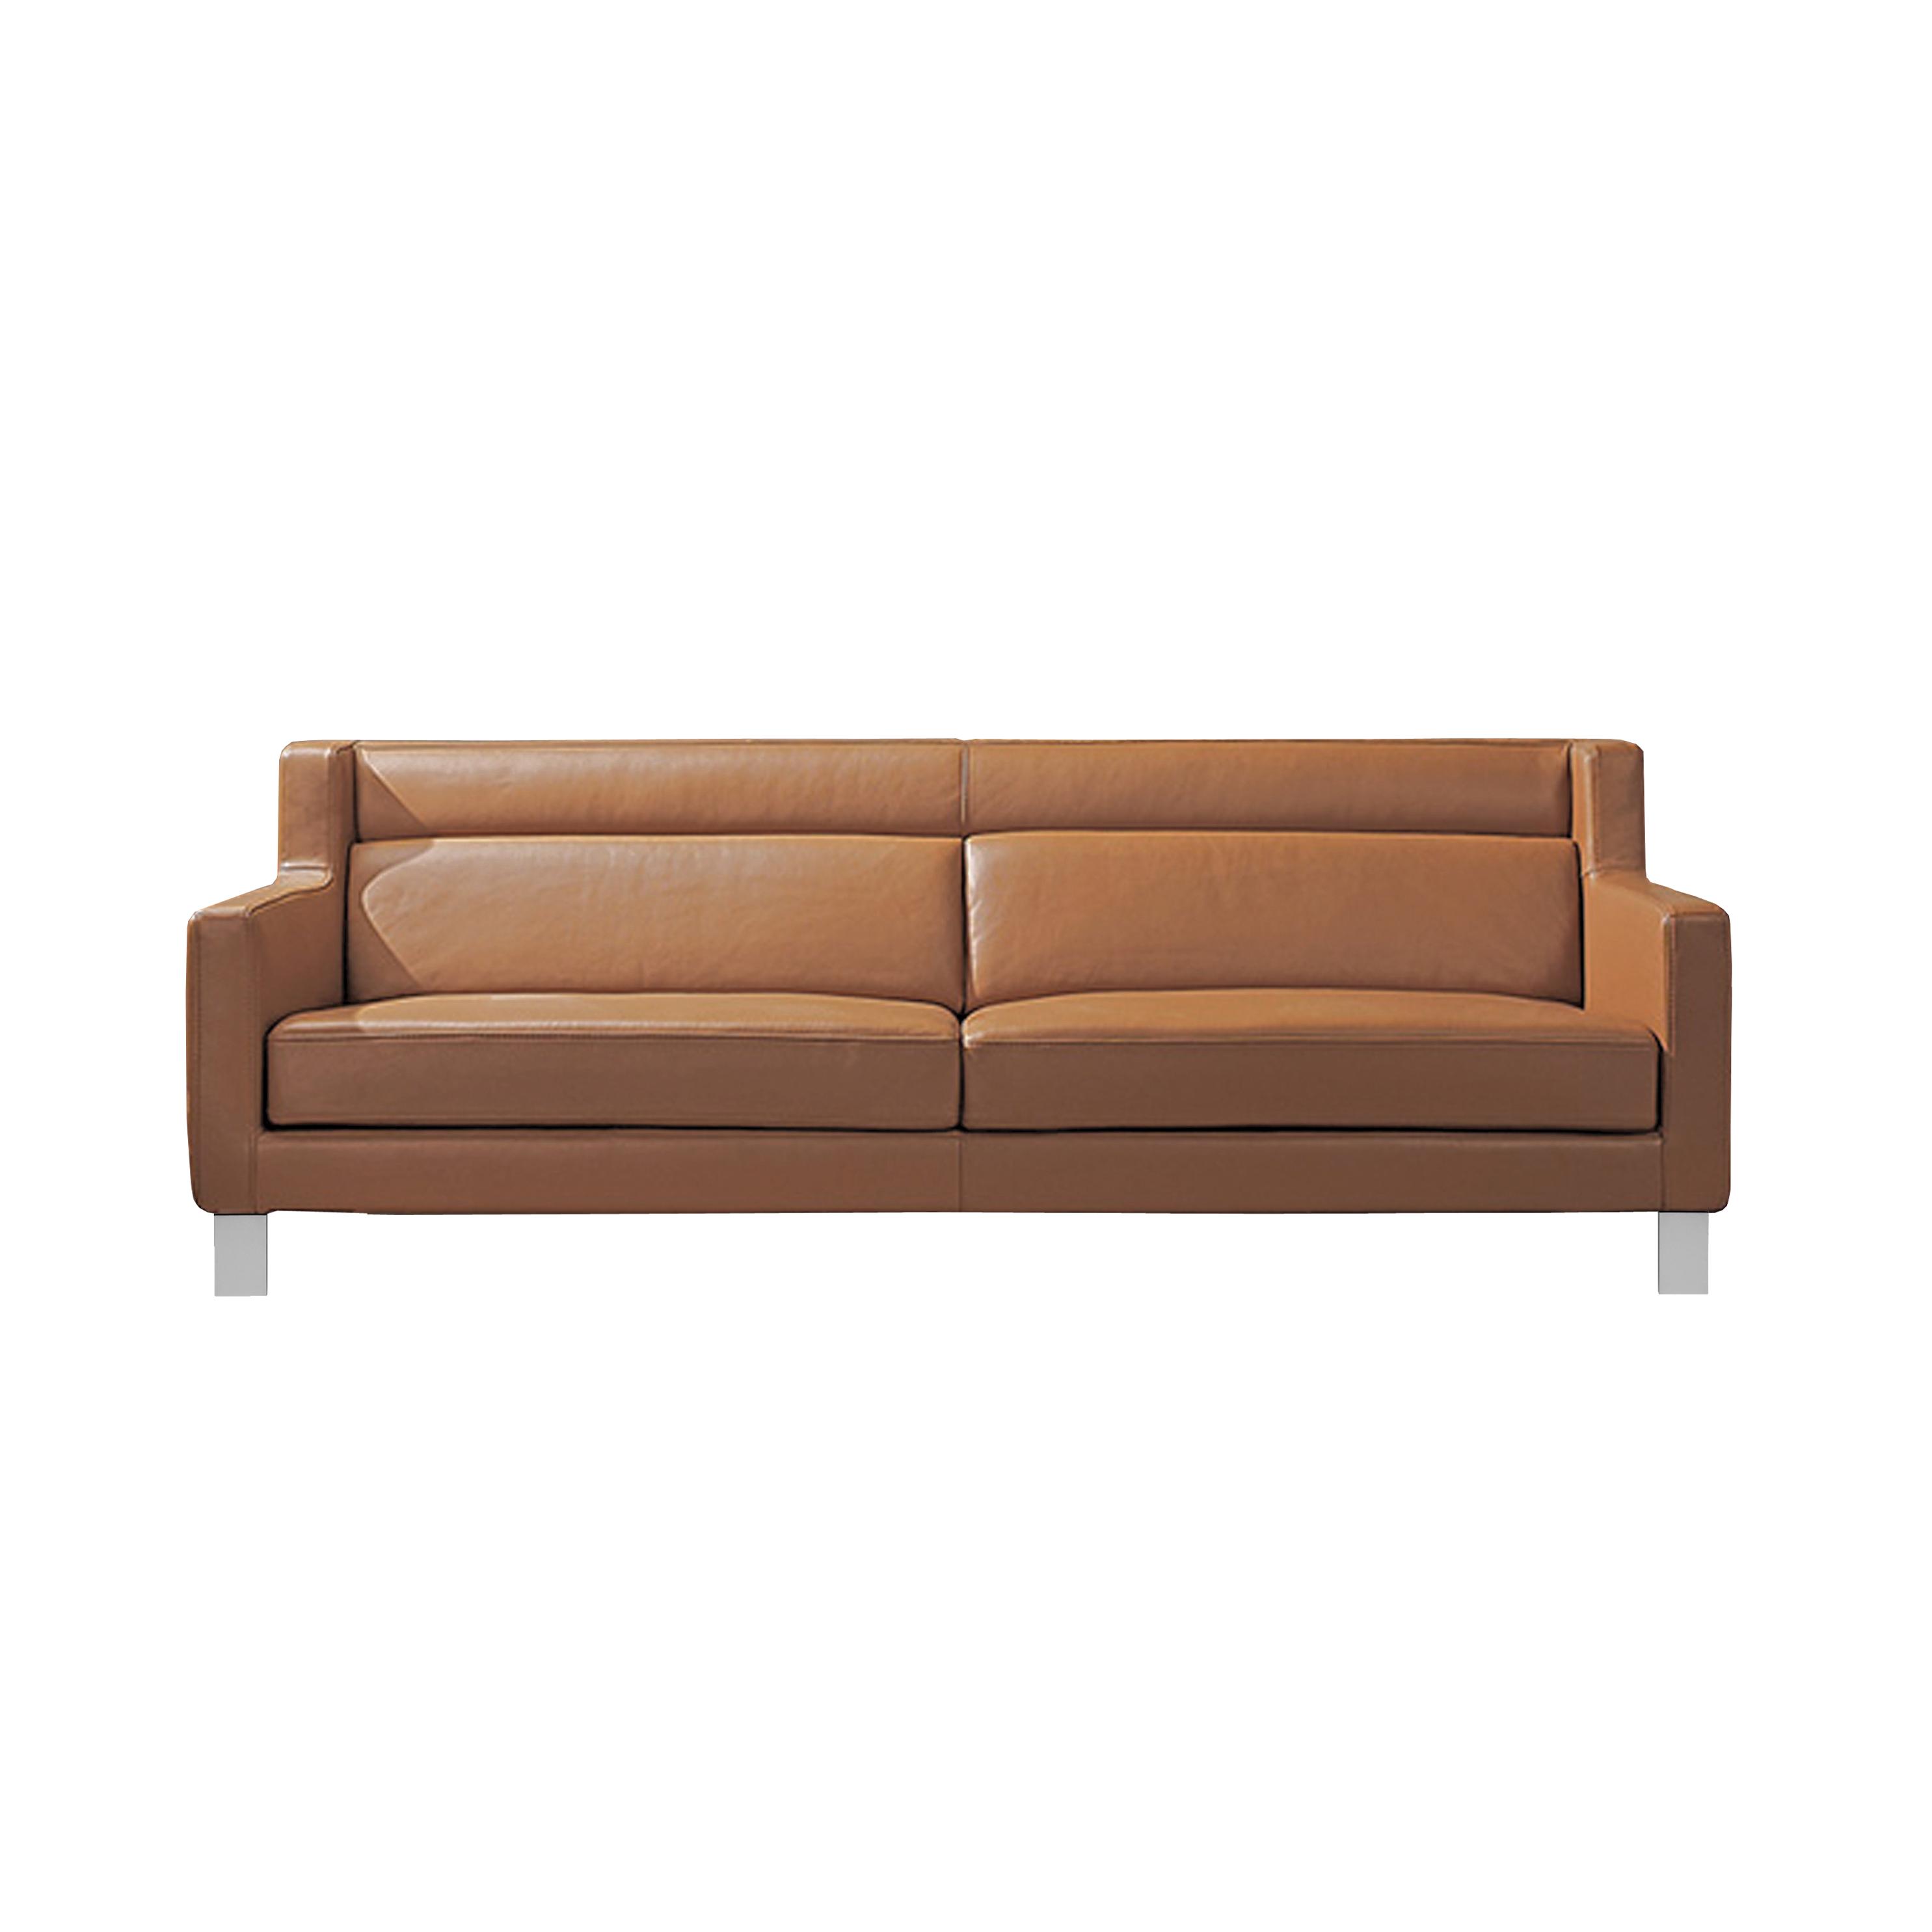 SPAZIOSO 4 SEATER SOFA Beyond Furniture